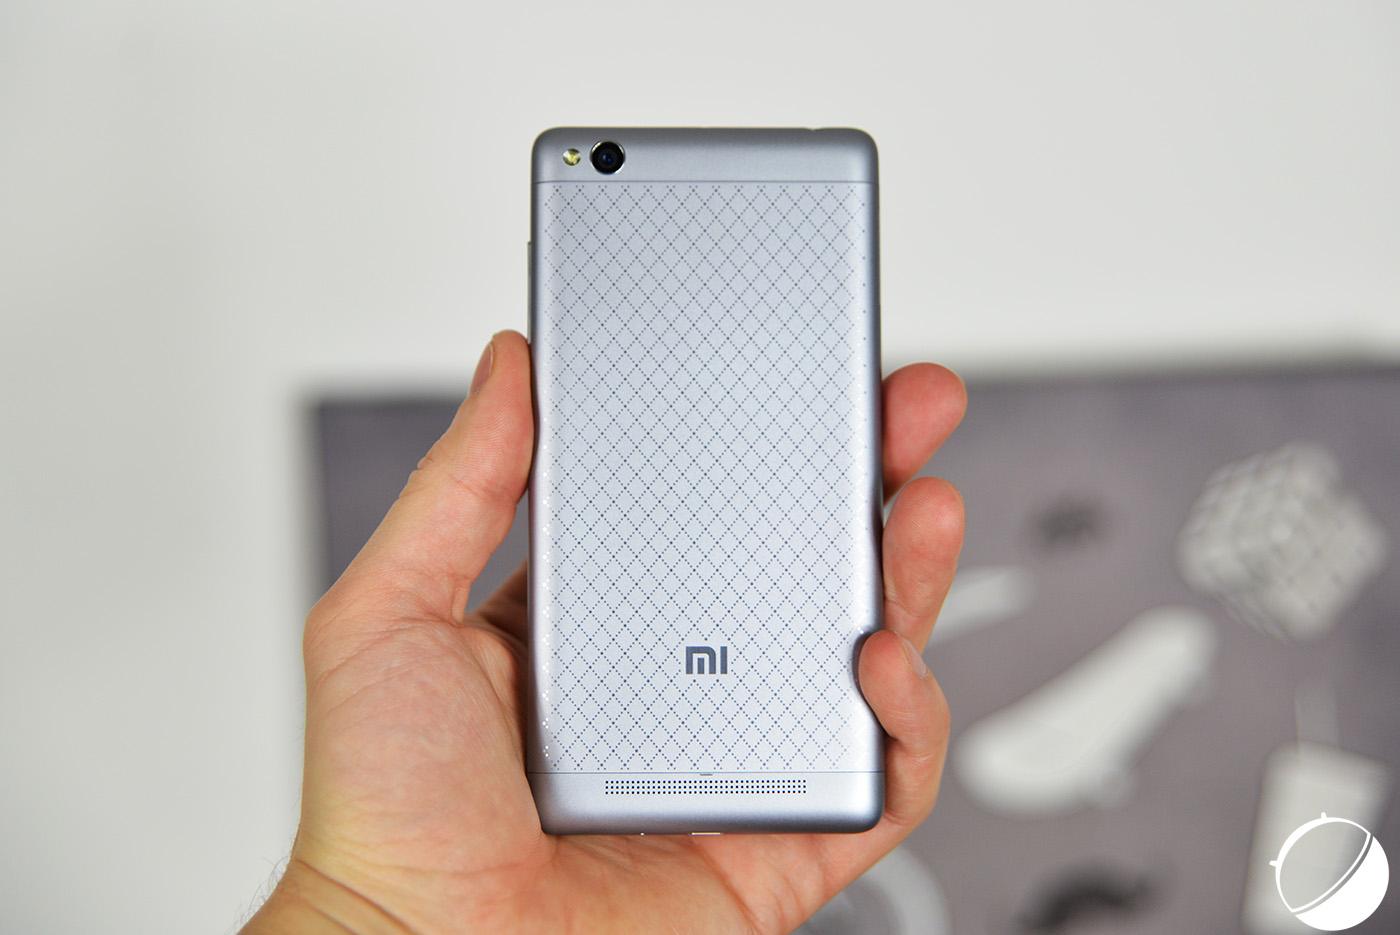 Bon Plan Le Xiaomi Redmi 3 Est Disponible 113 Euros Frandroid 1